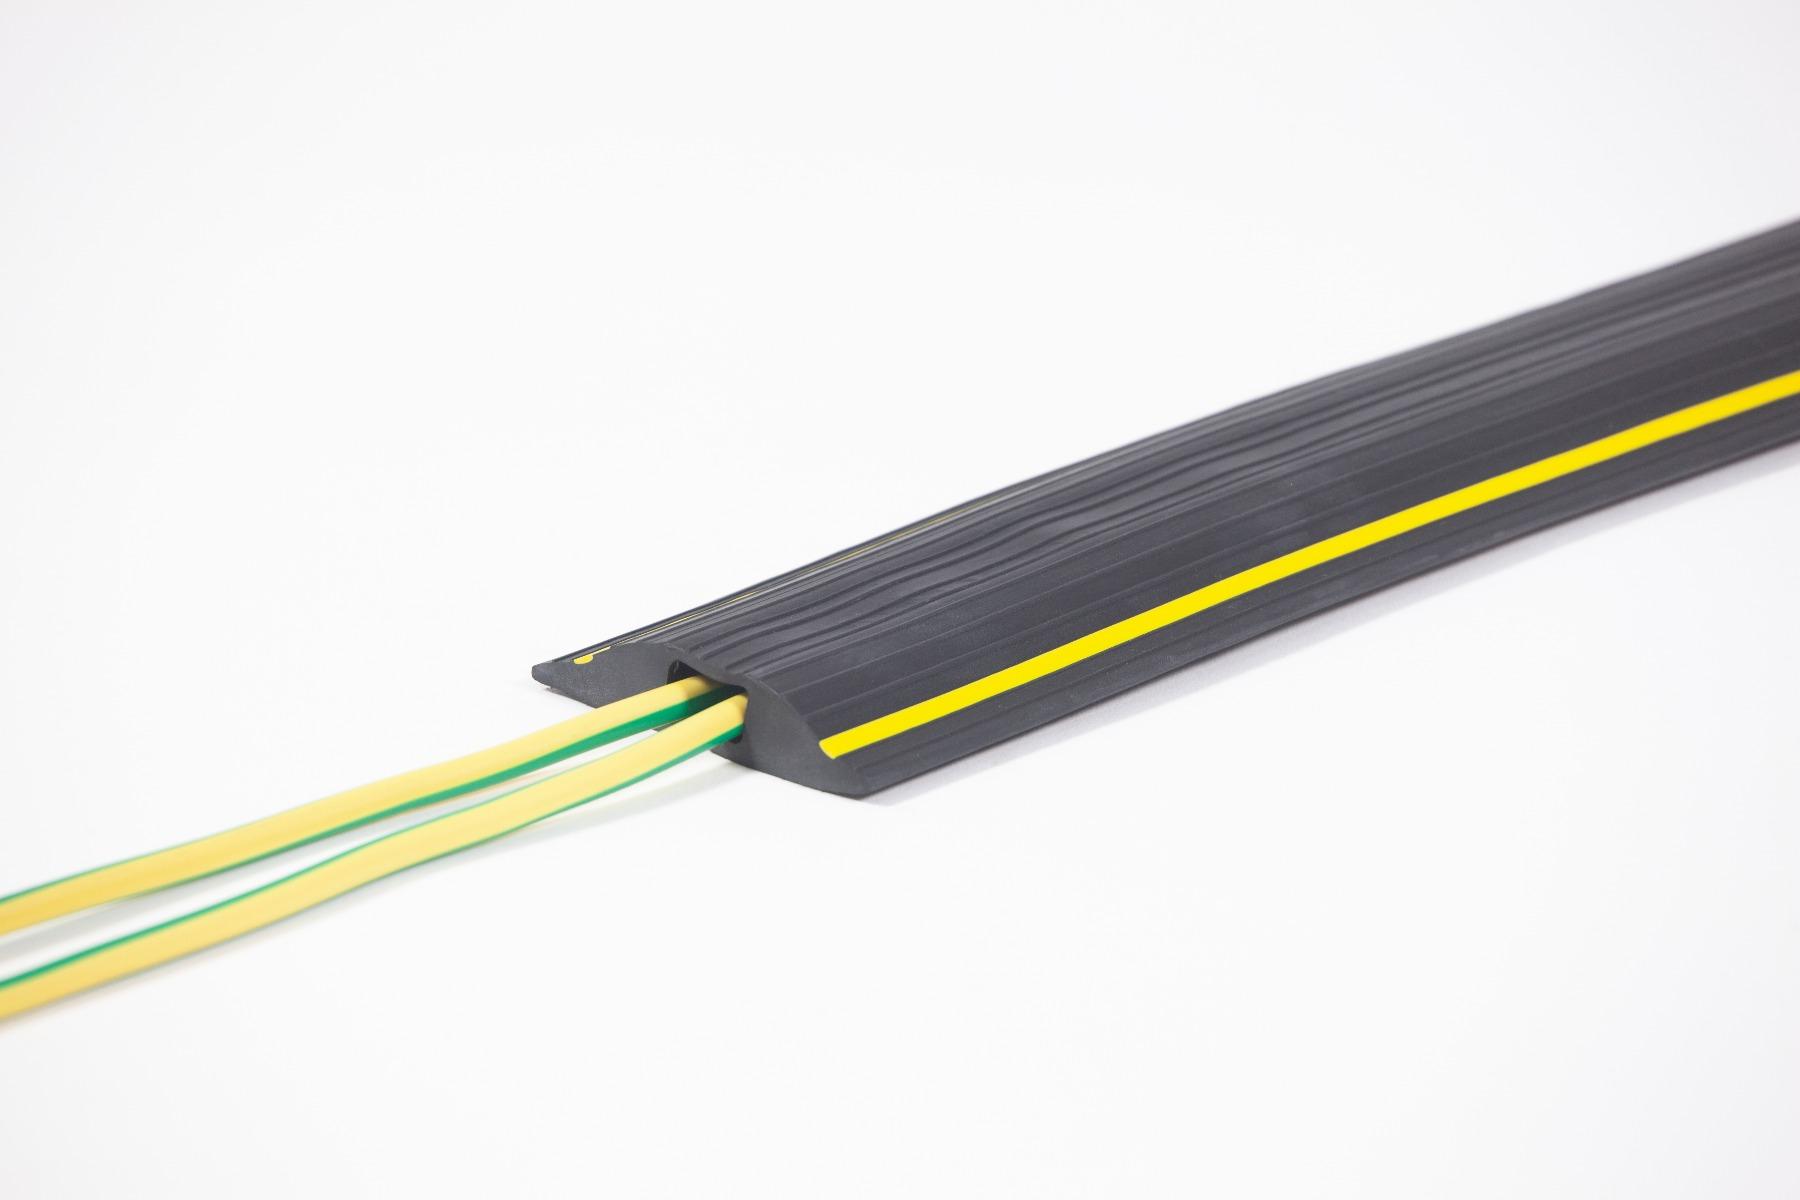 1-Kanal Flexibler Kabelkanal